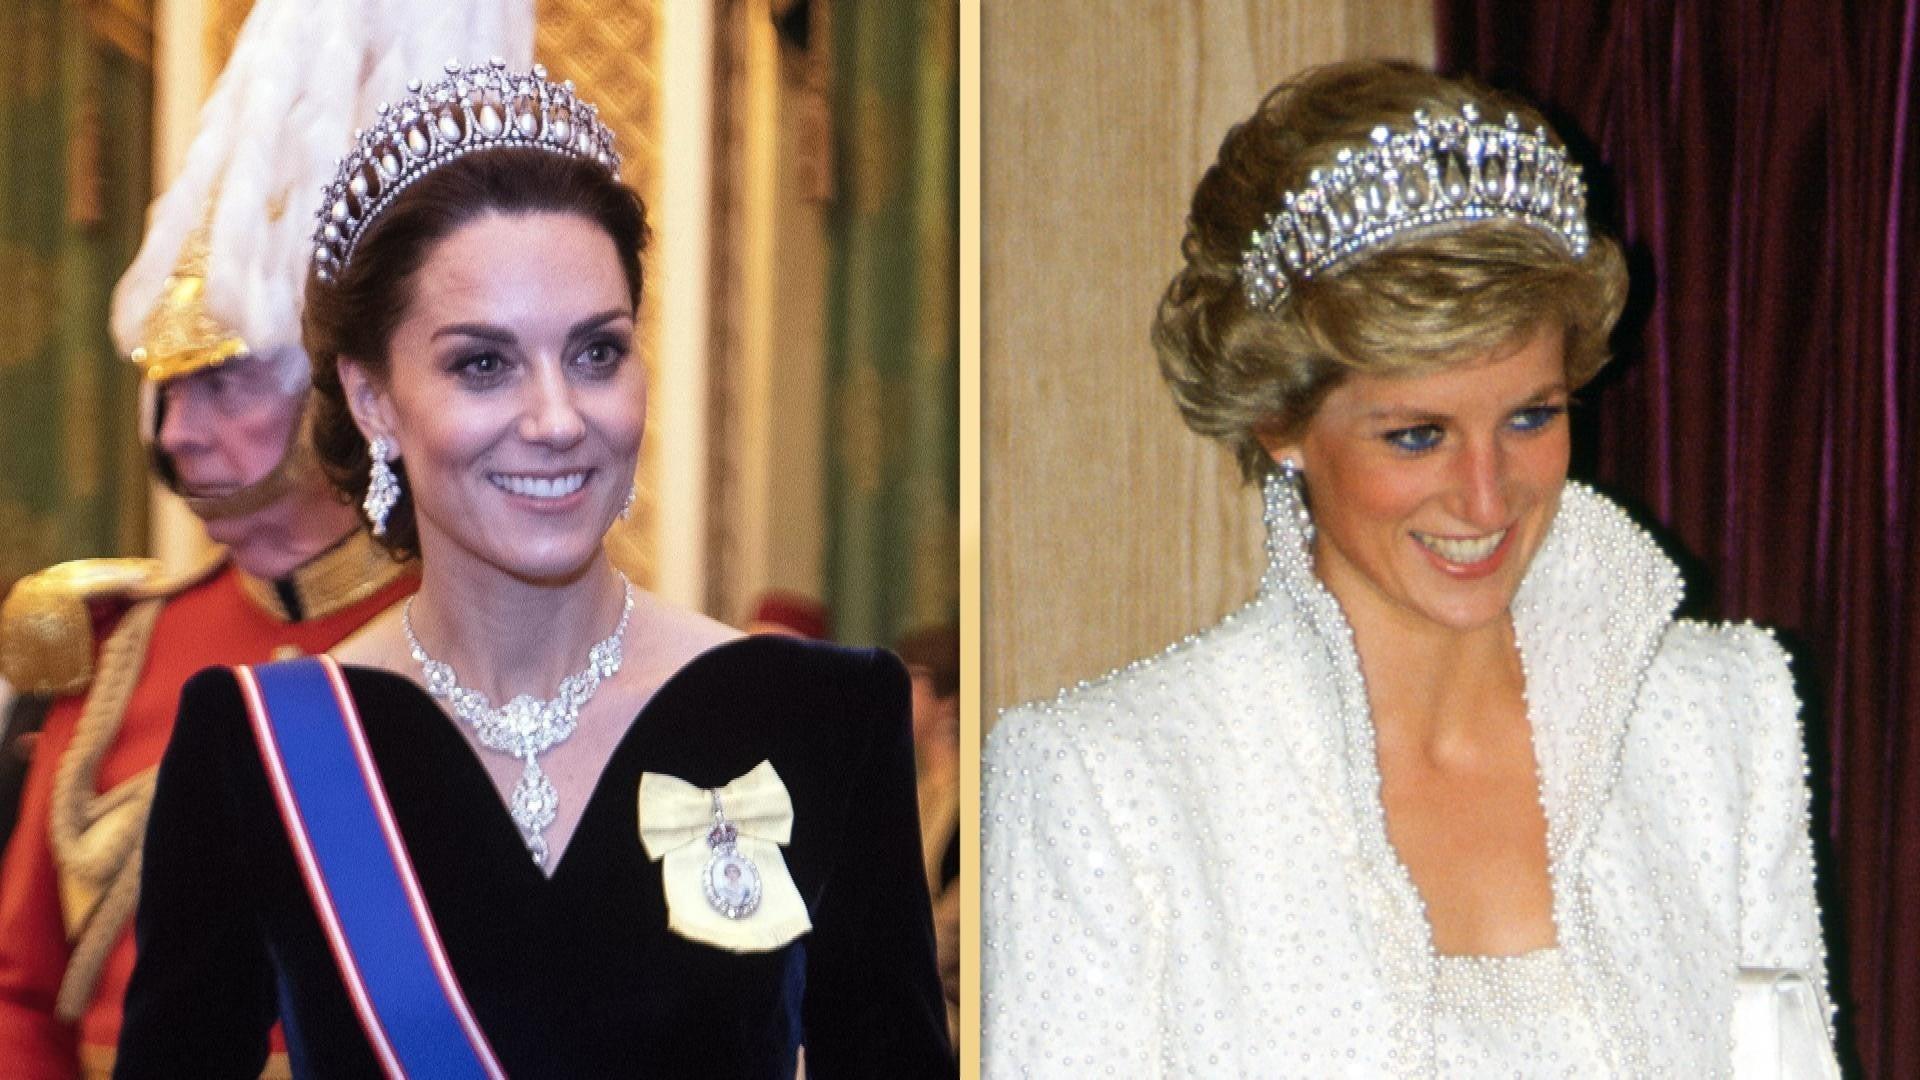 Kate Middleton Recycles Princess Dianas Tiara As Queen